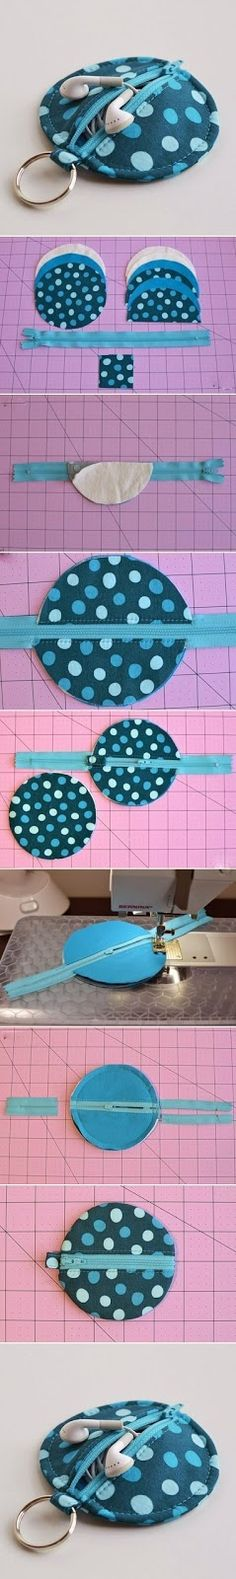 DIY Earphone Case diy ideas, diy crafts, earphon case, craft idea, diy project, craft project, diy earphones, diy case, diy purse ideas